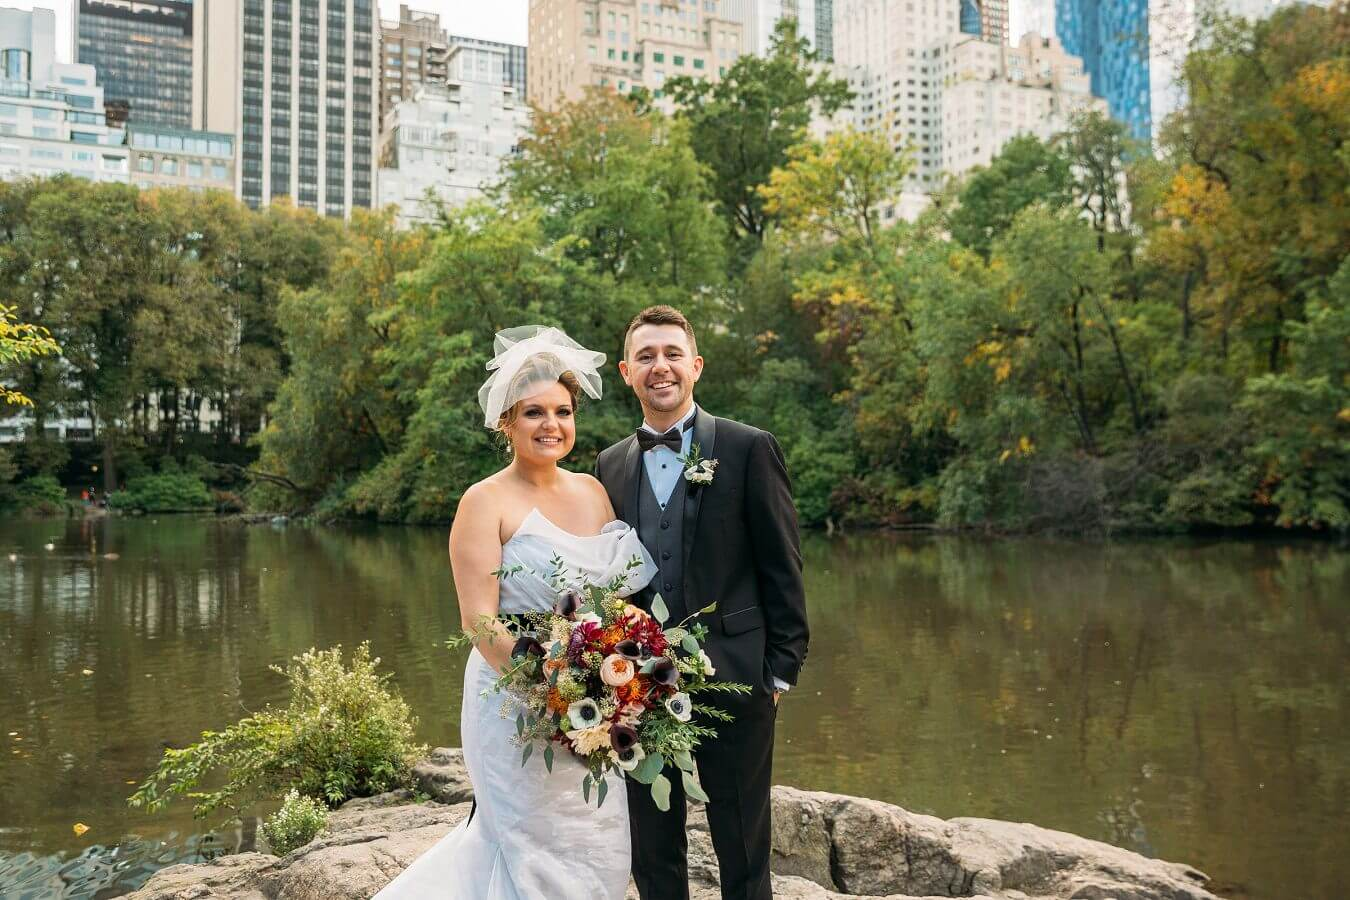 Wedding Couple poses by Gapstow Bridge with NYC Skyline